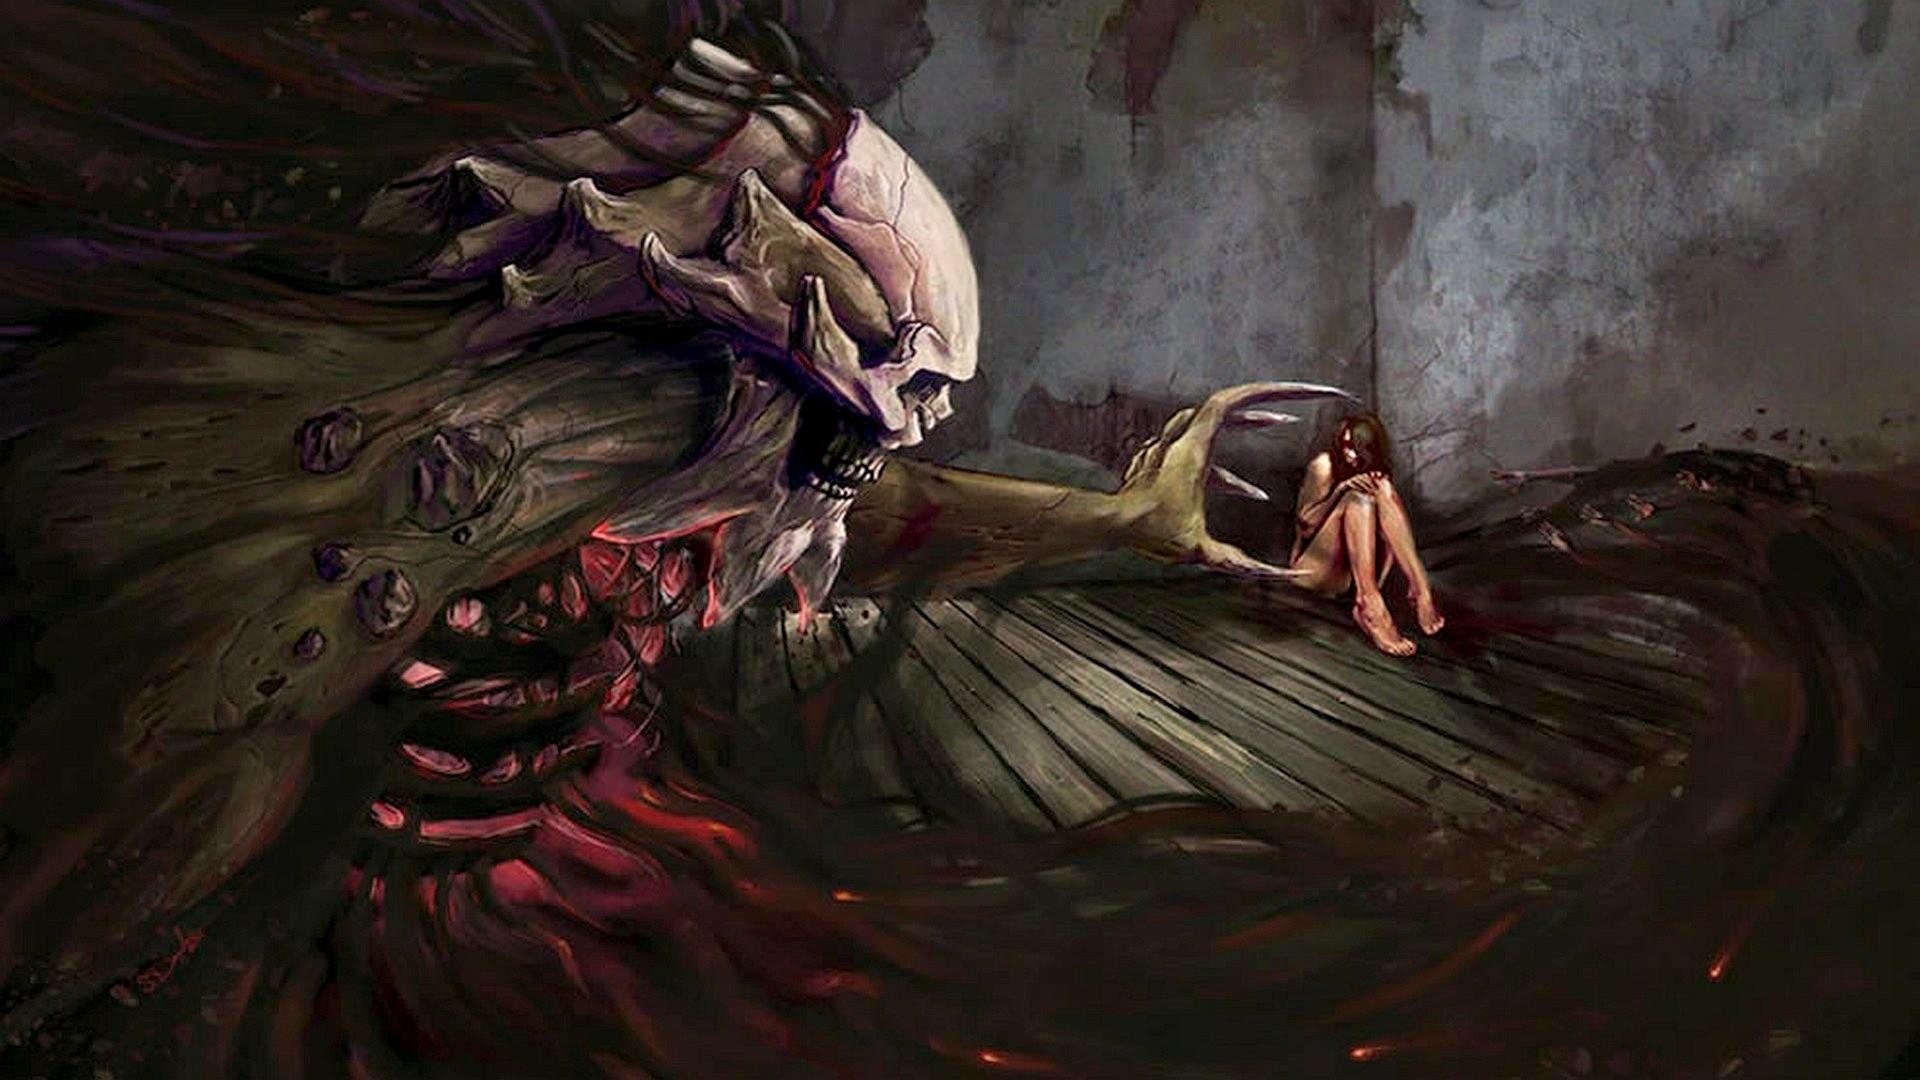 Res: 1920x1080, Art Jennifer Gelinas Black Fantasy Wings Girl Demon Gothic Dark .